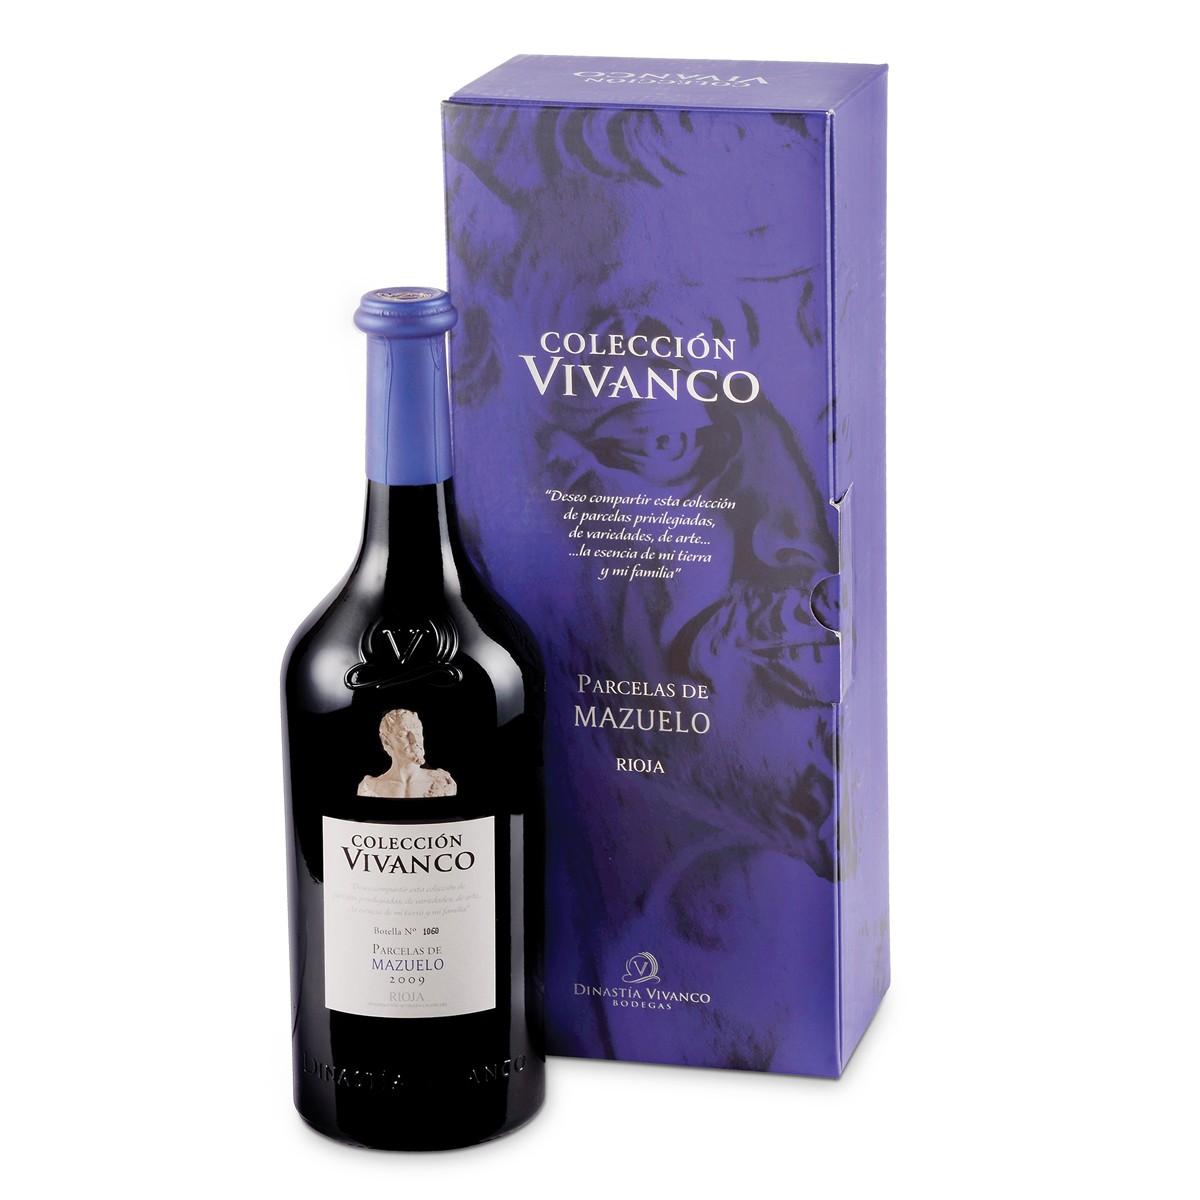 Colección Vivanco Parcelas de Mazuelo